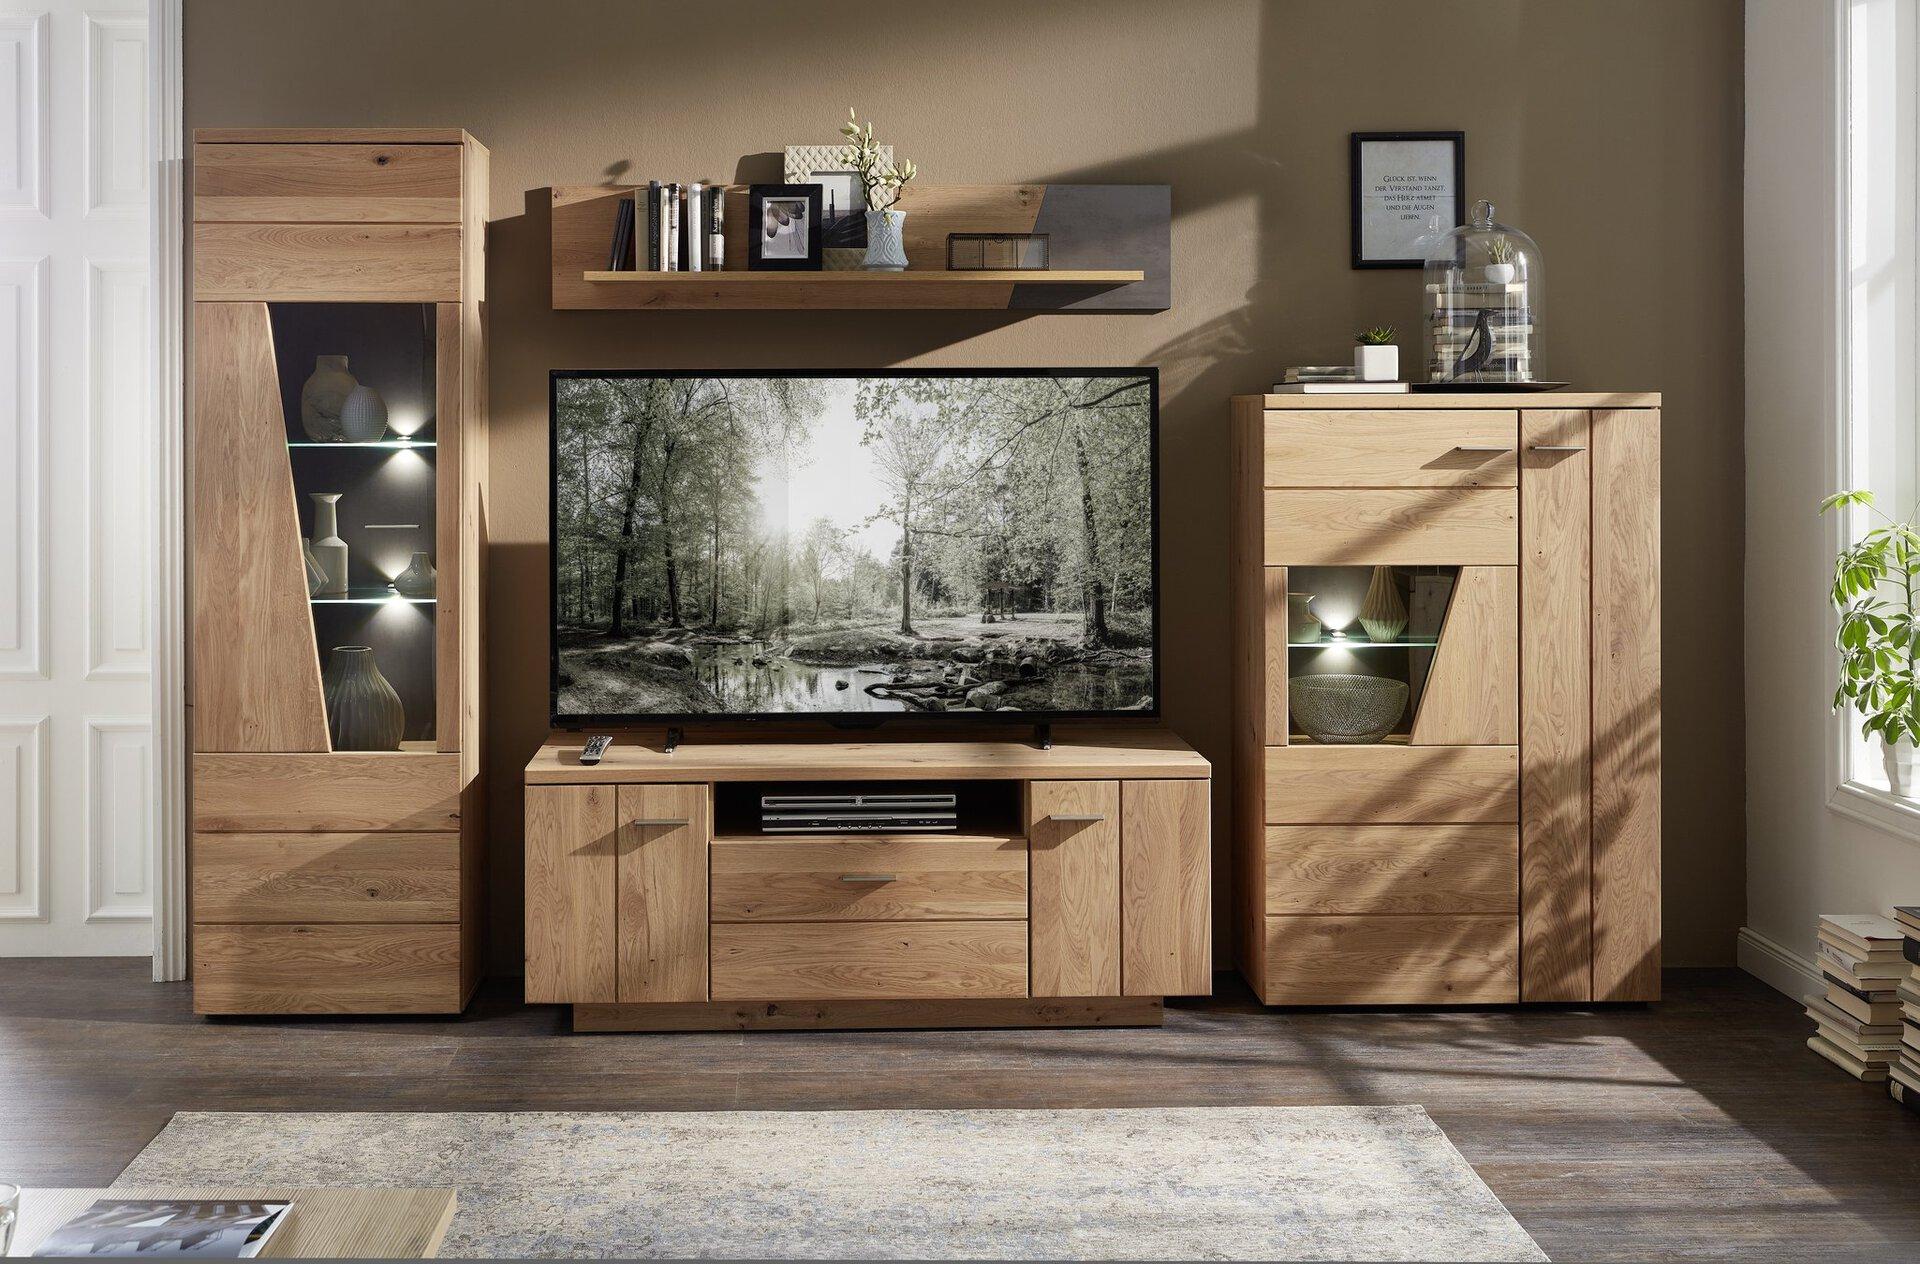 Wohnwand RUBINO CELECT Holzwerkstoff braun 50 x 200 x 330 cm